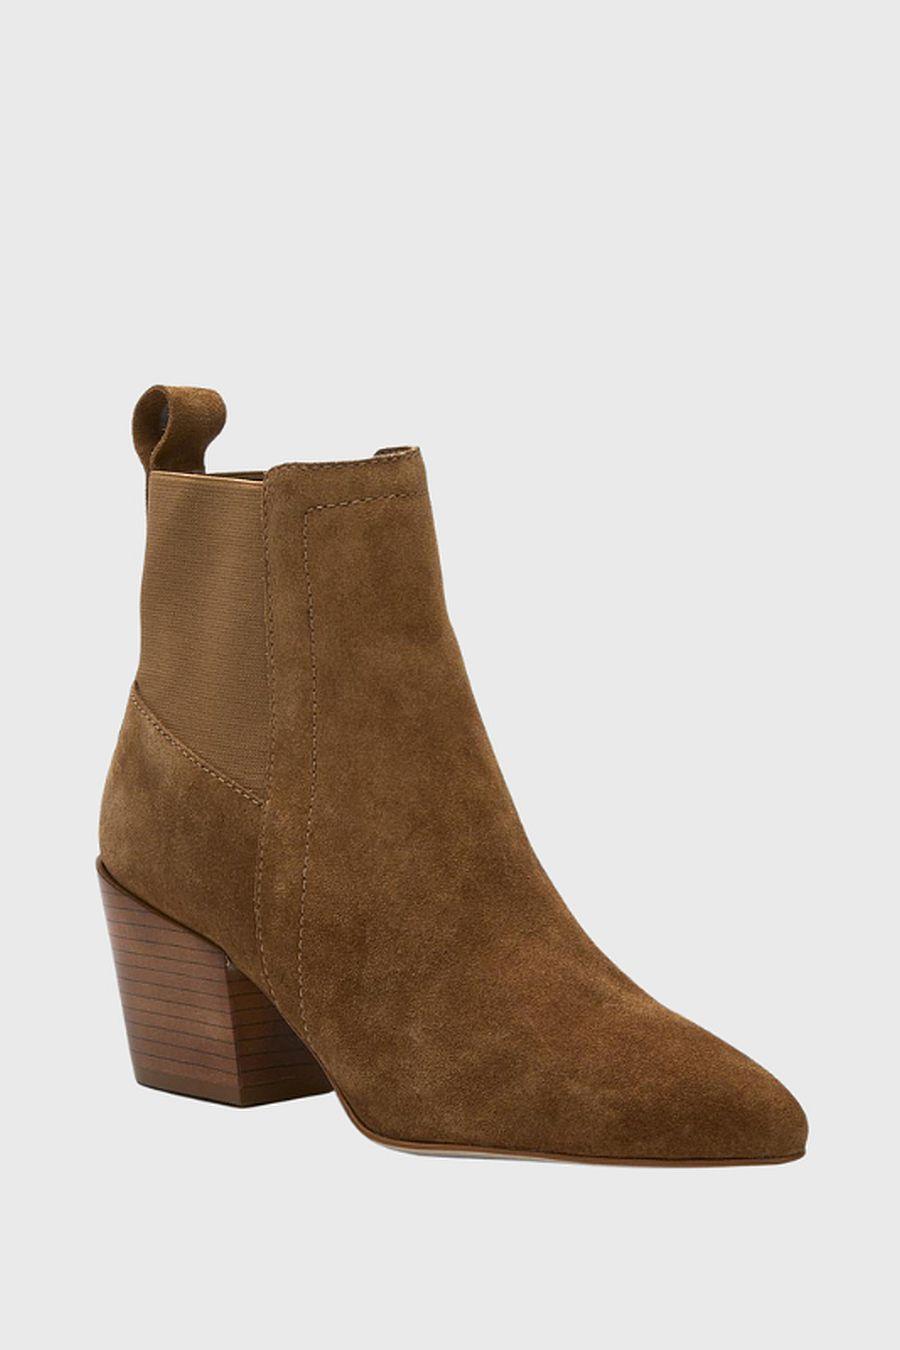 Matisse Footwear Harper Western Bootie - fawn